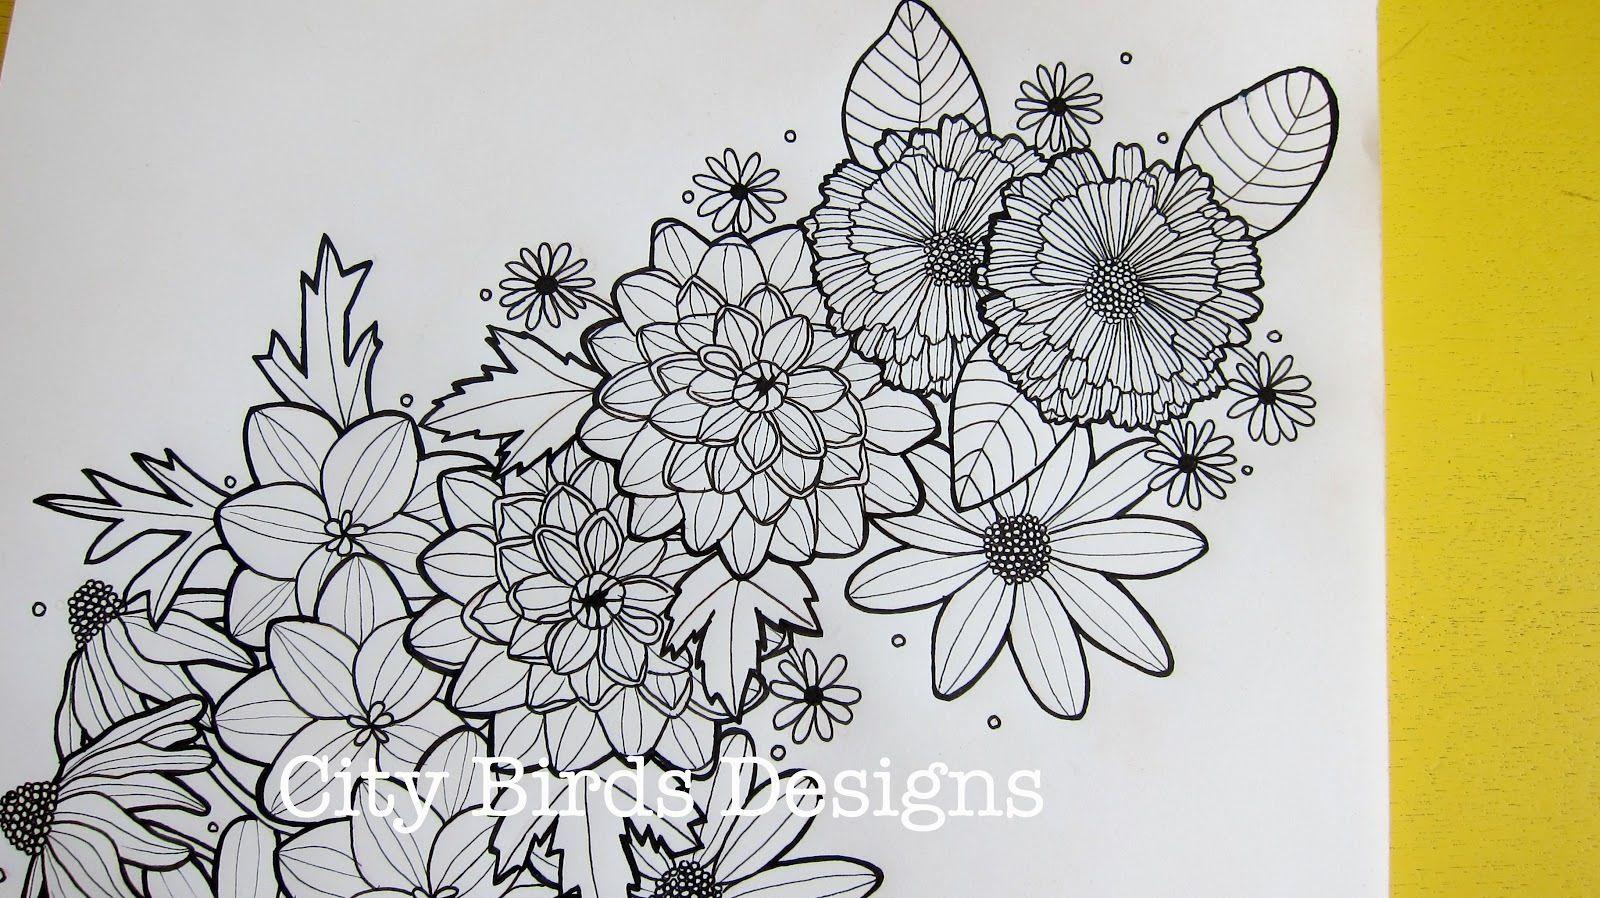 Flower tattoo sketch for half sleeve my style pinterest flower